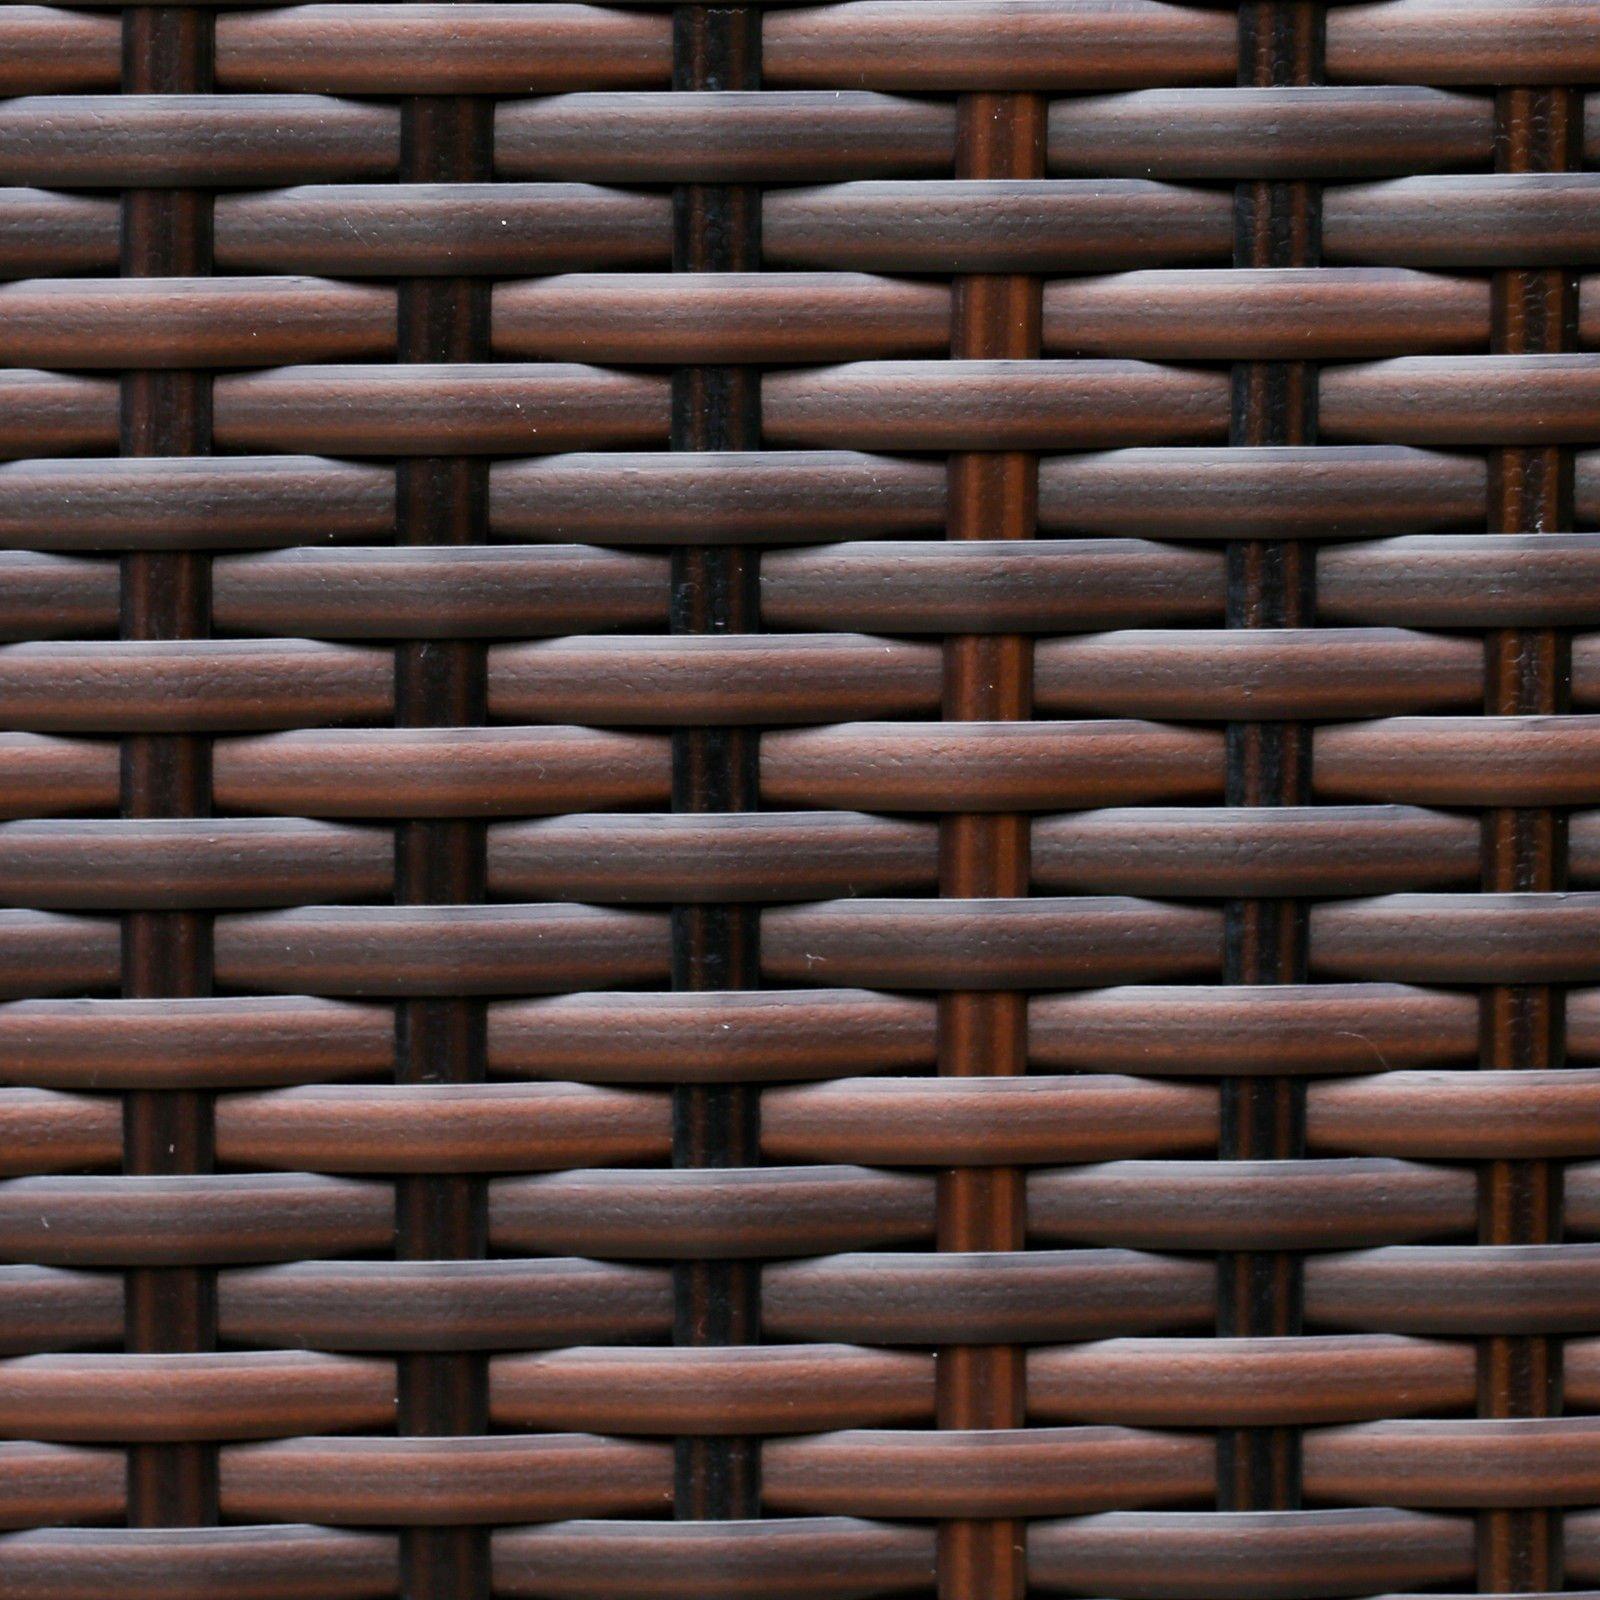 6ec9ba83572e Abreo Brown Rattan Garden Furniture Sofa Set Wicker Weave 4 Seater Patio  Conservatory Luxury